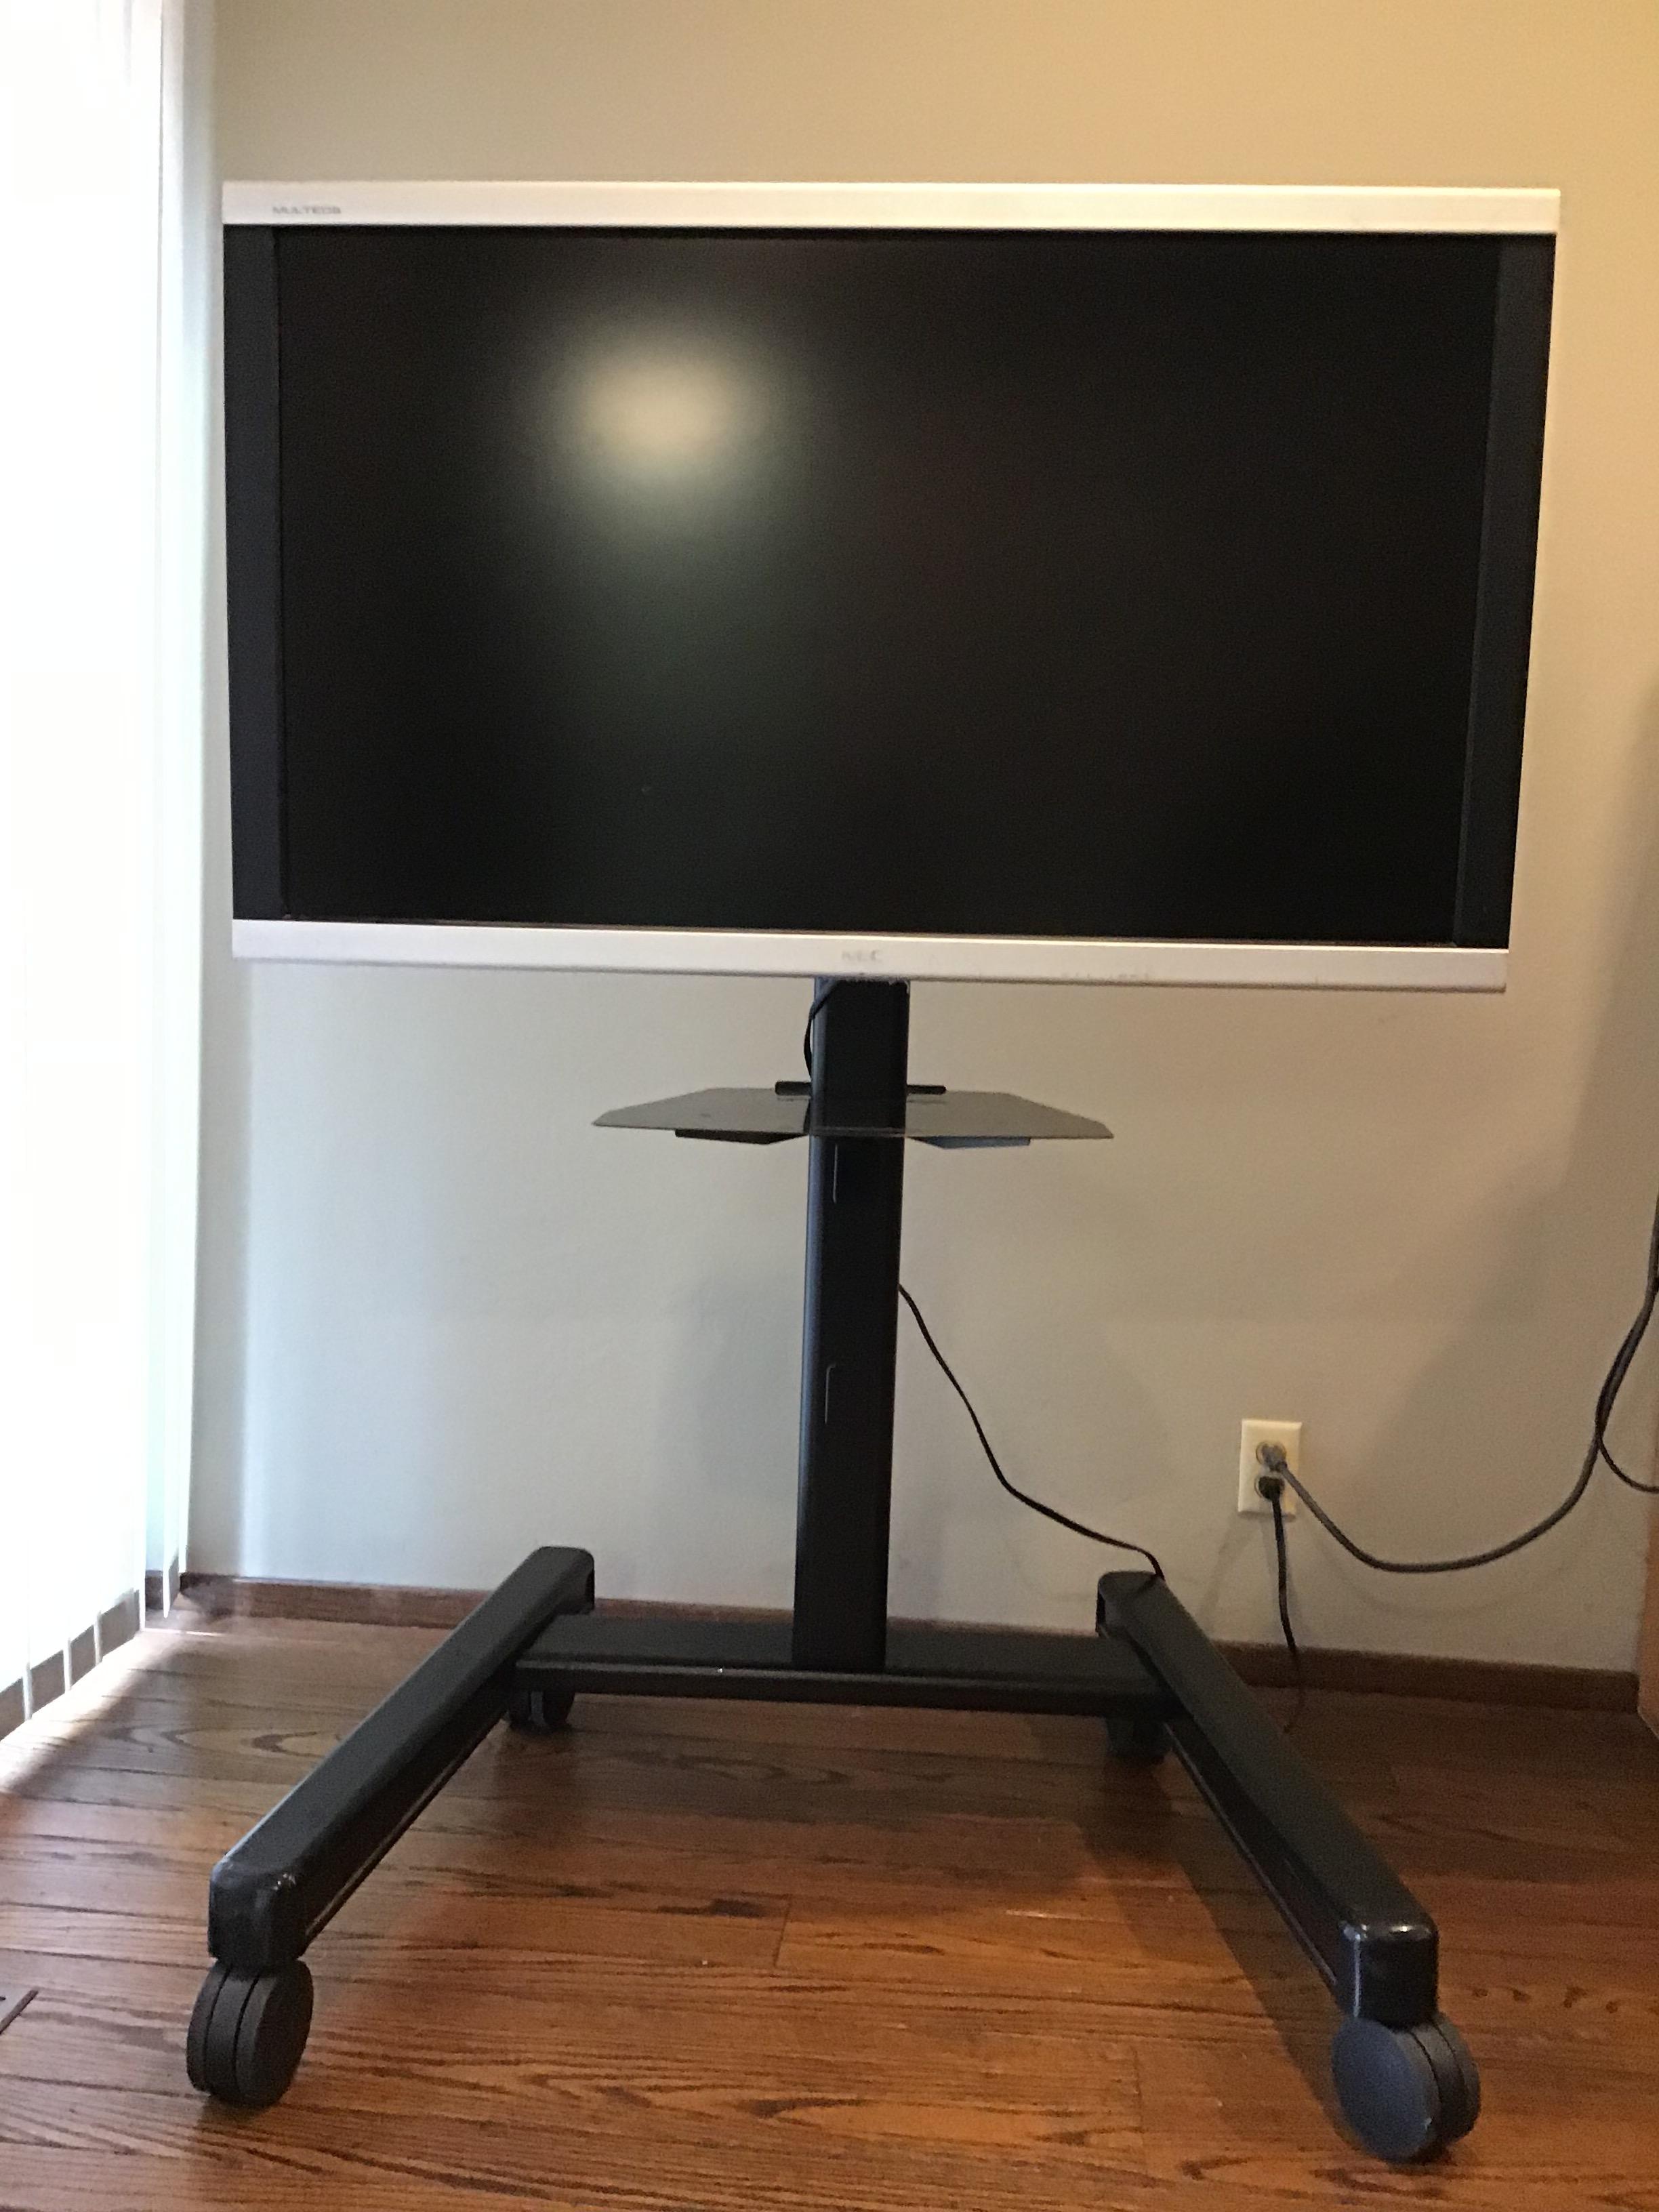 NEC Multeos Monitor